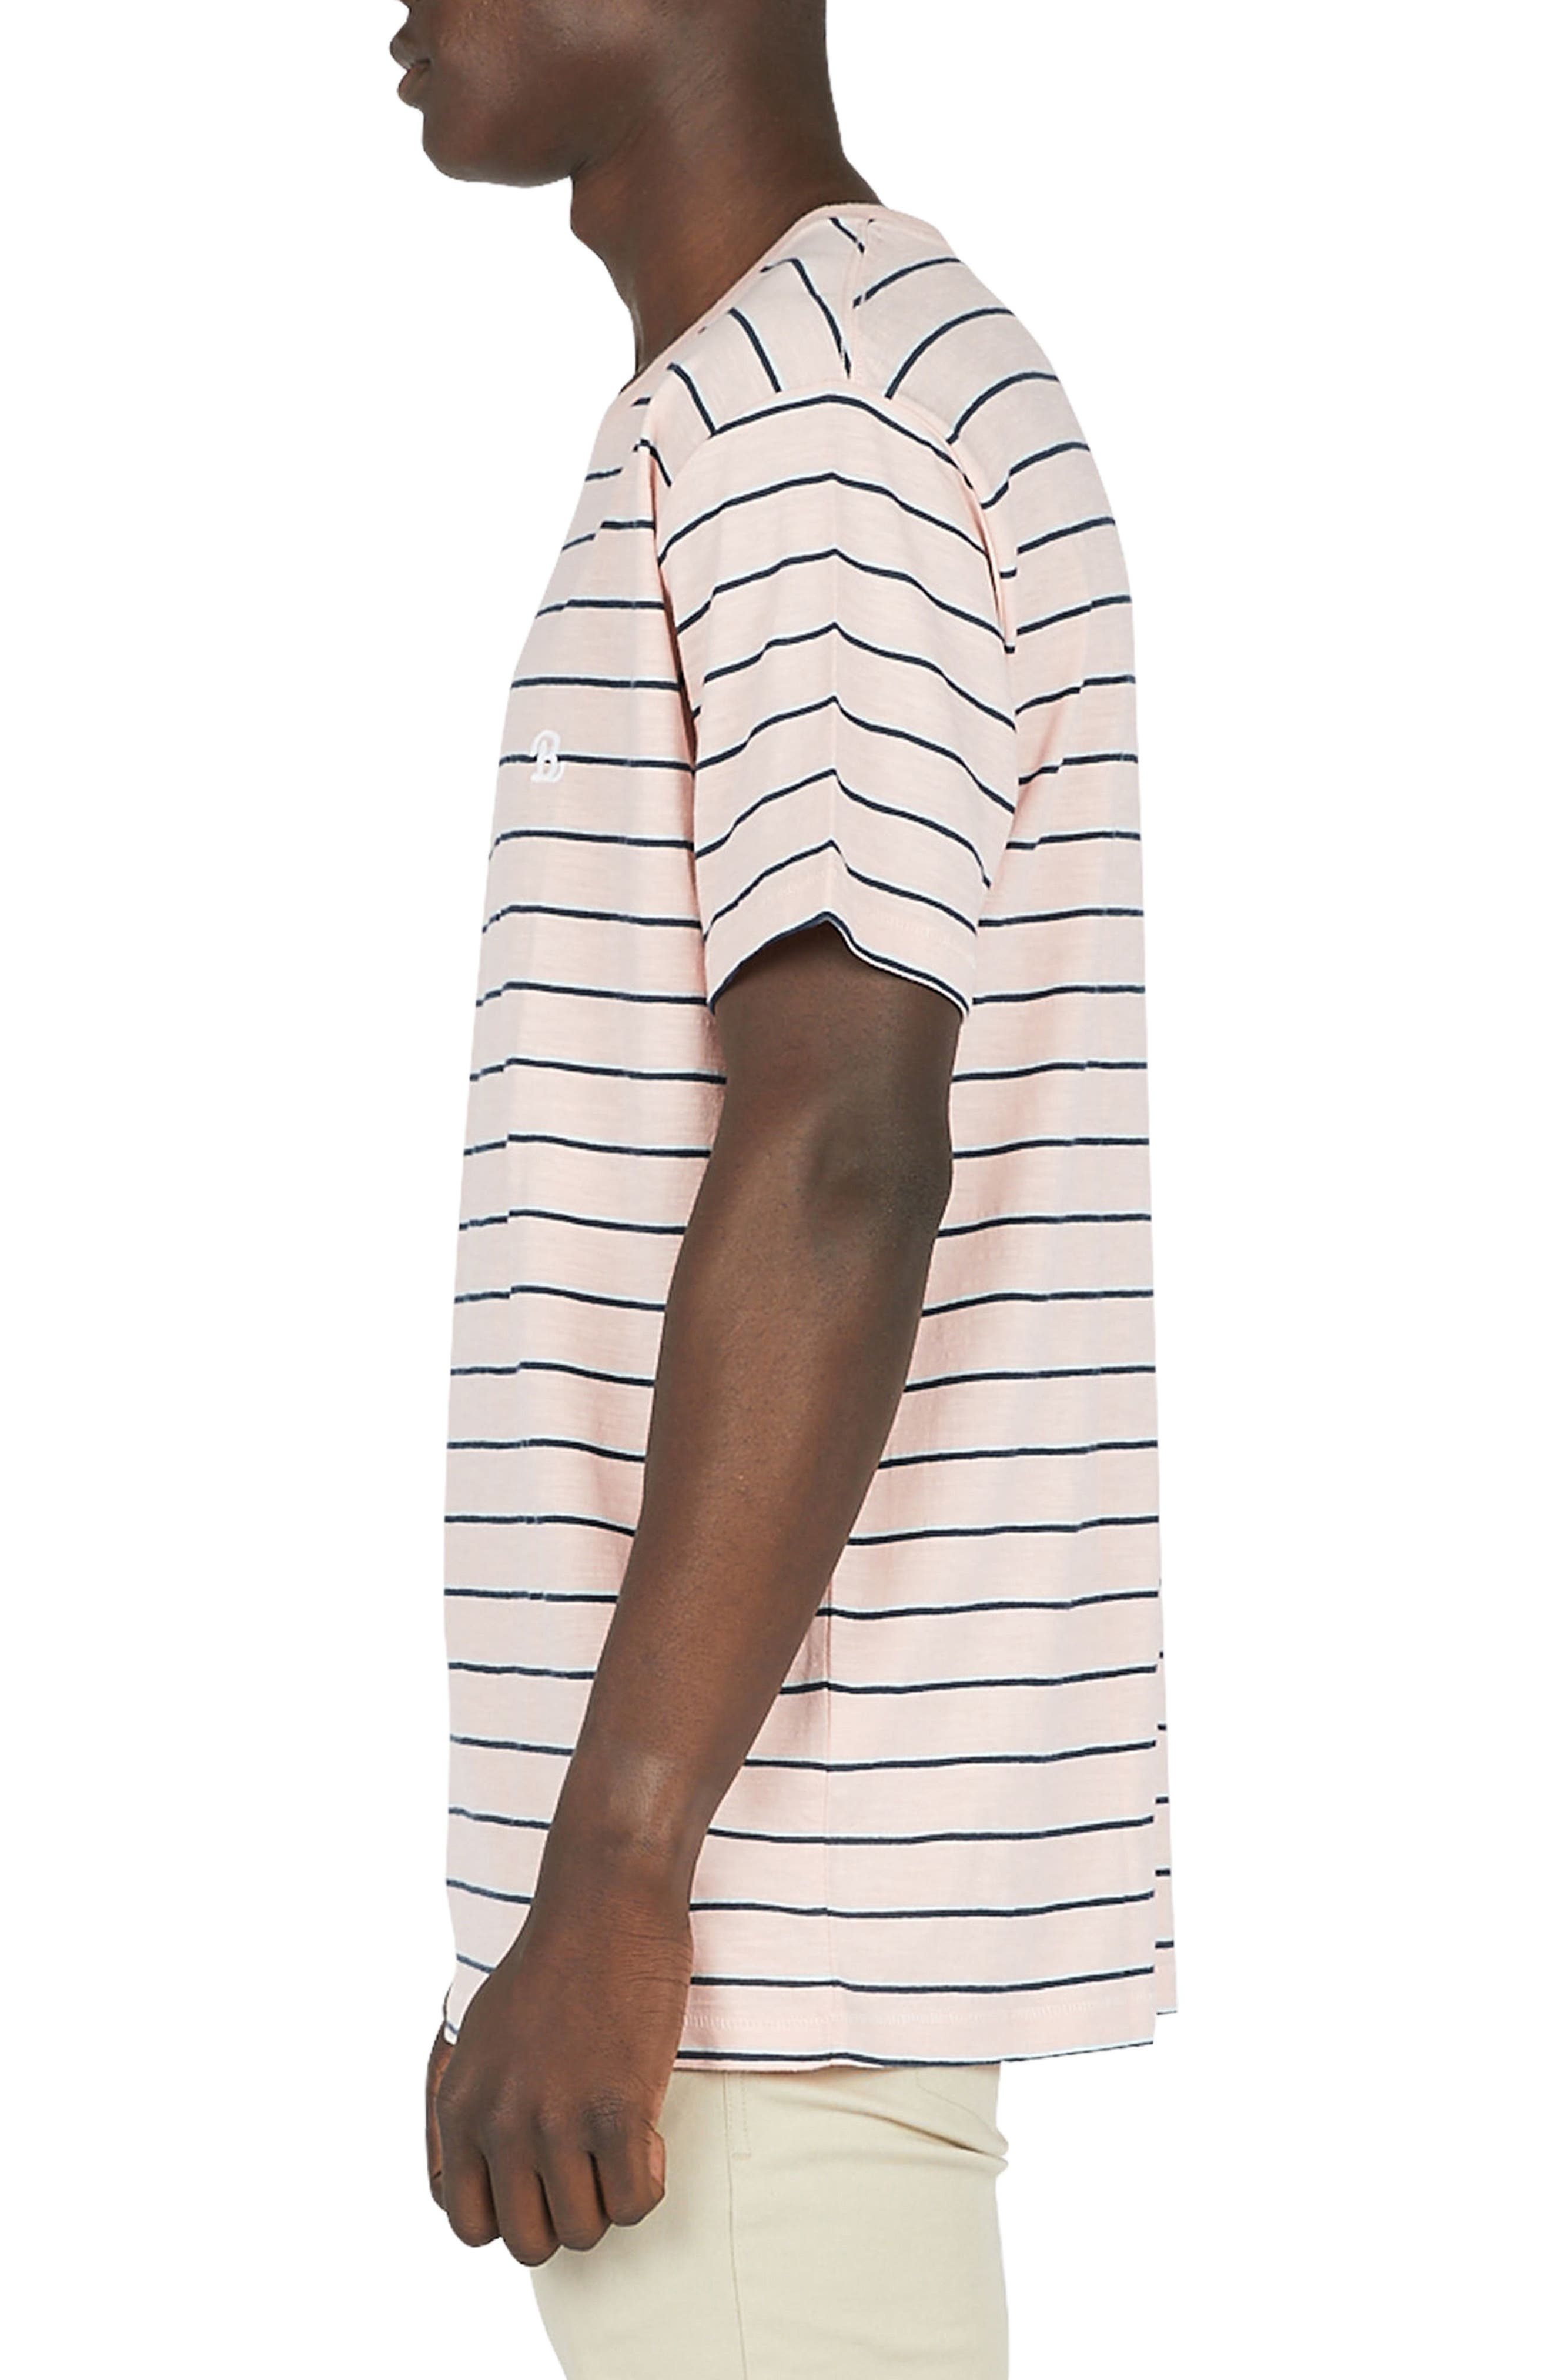 B.Schooled T-Shirt,                             Alternate thumbnail 3, color,                             Pink Stripe